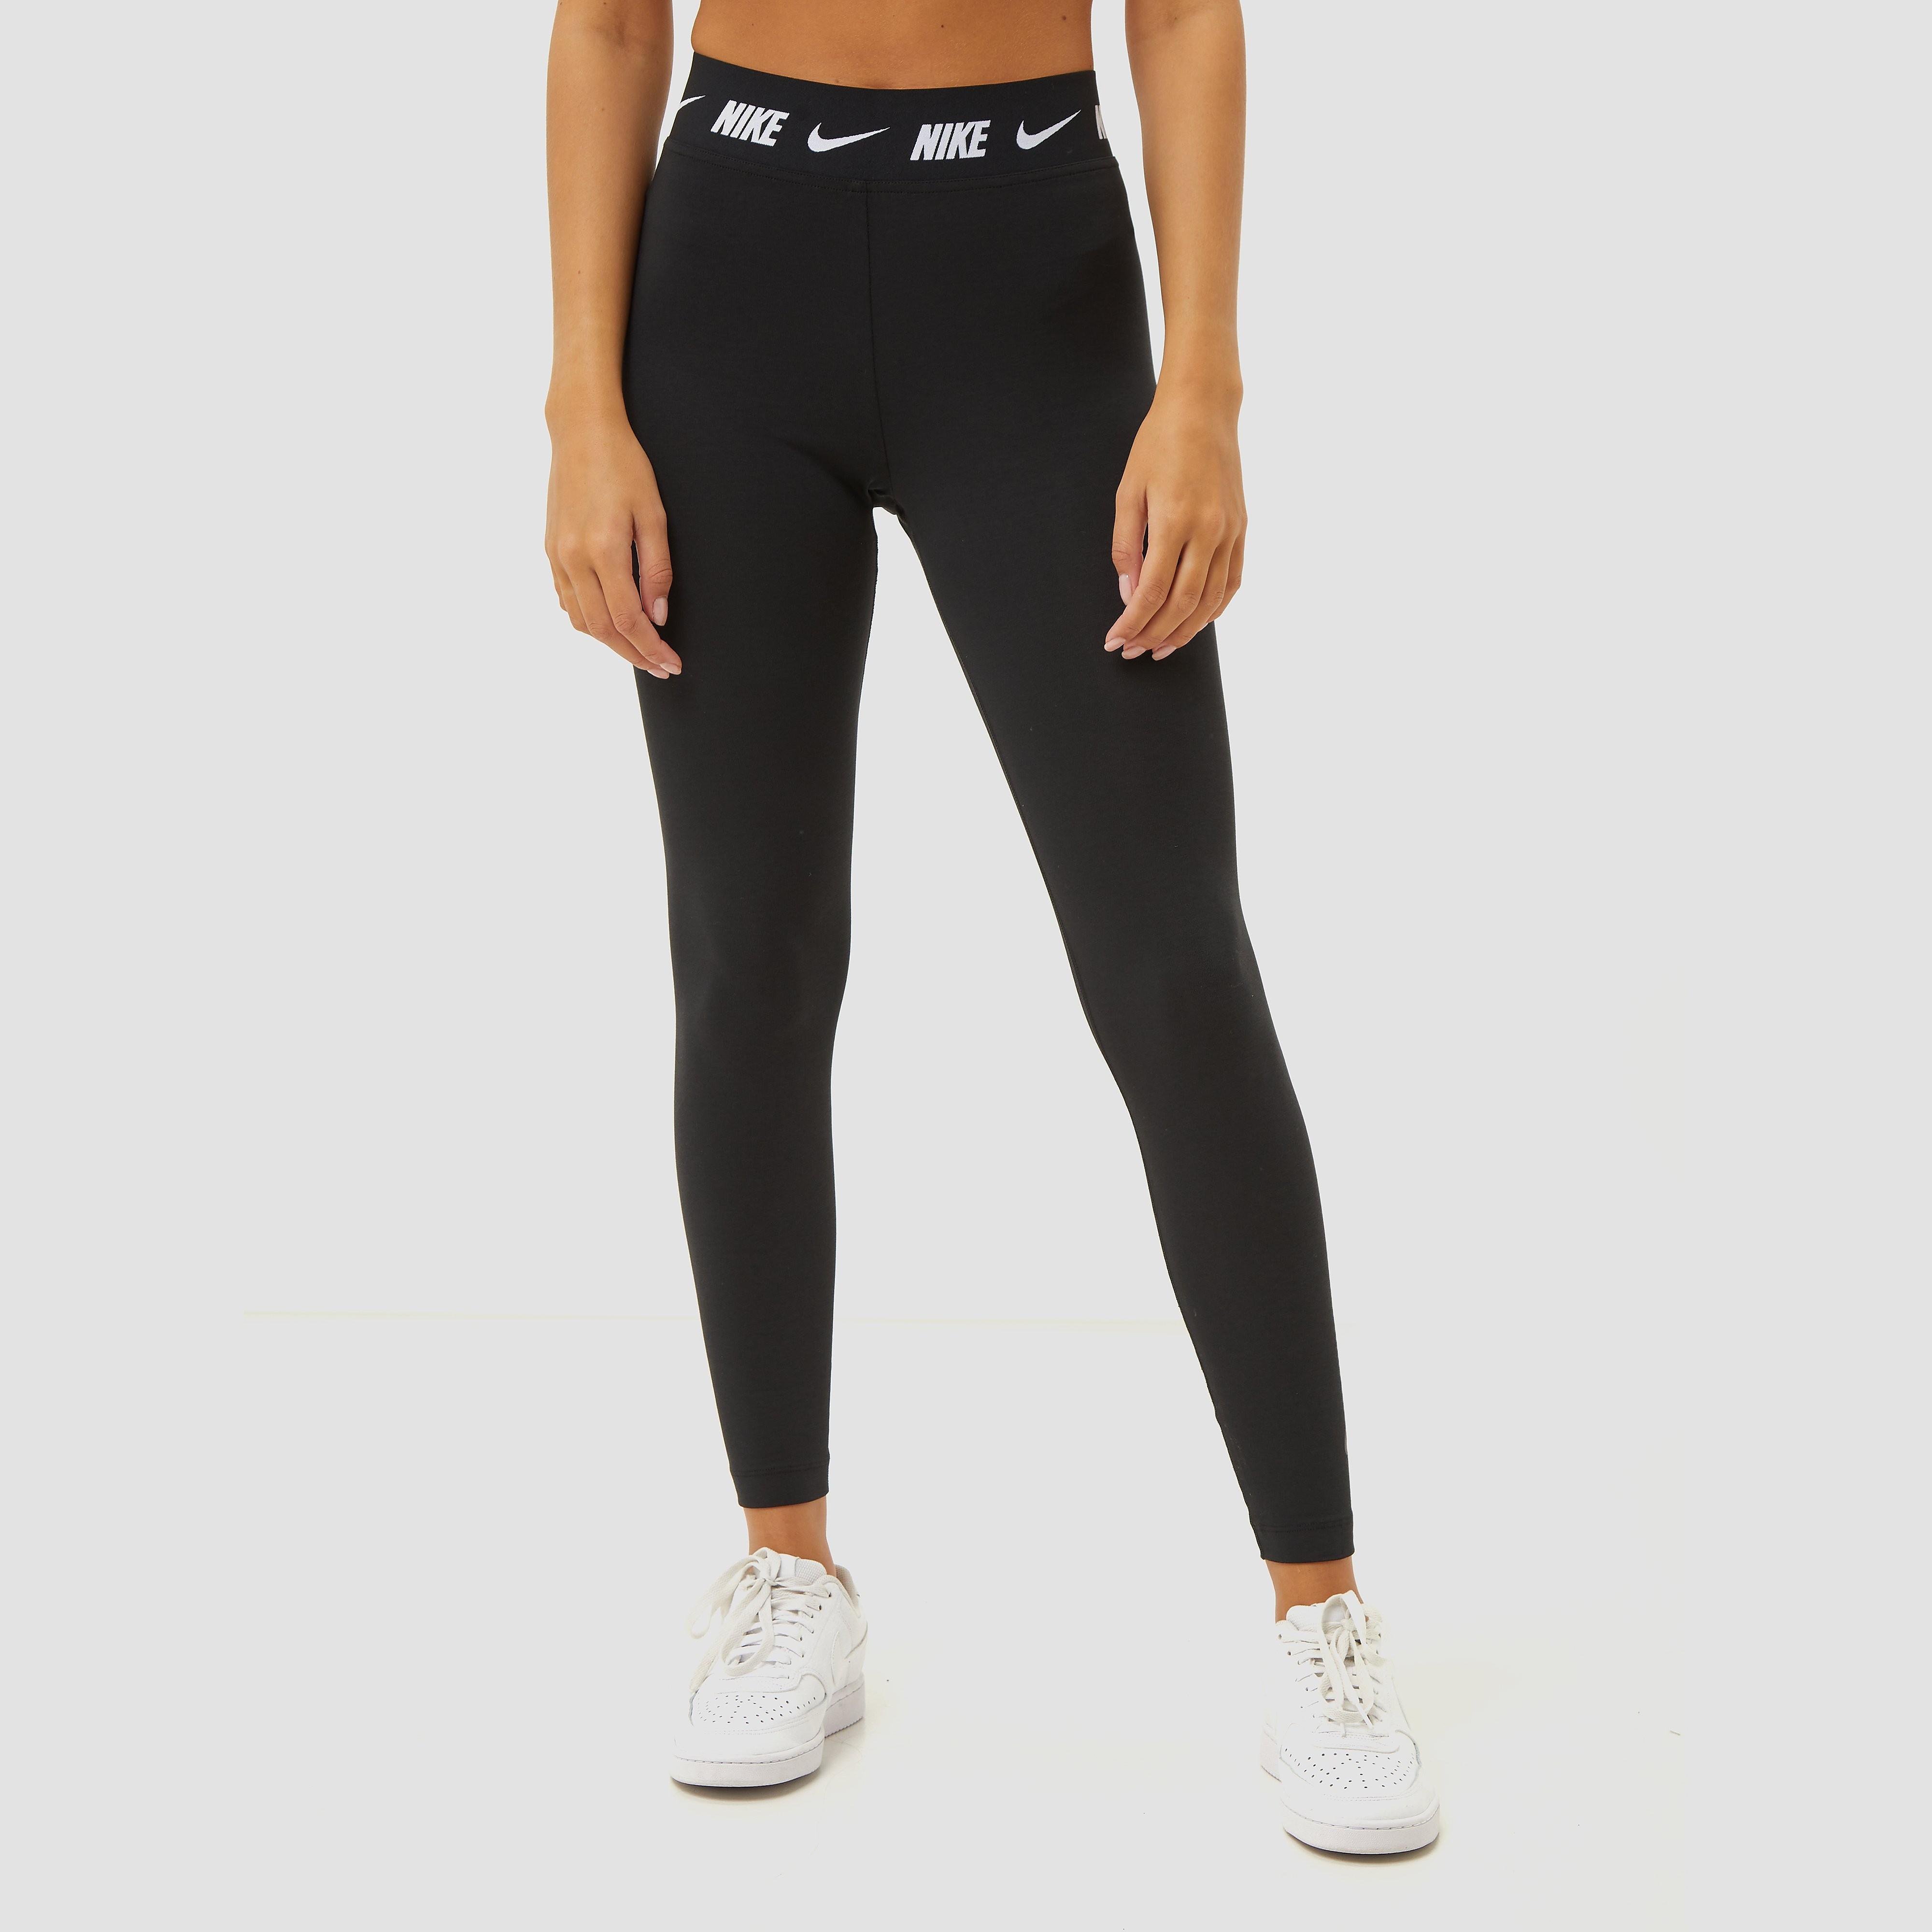 Nike Nike sportswear club legging zwart dames dames